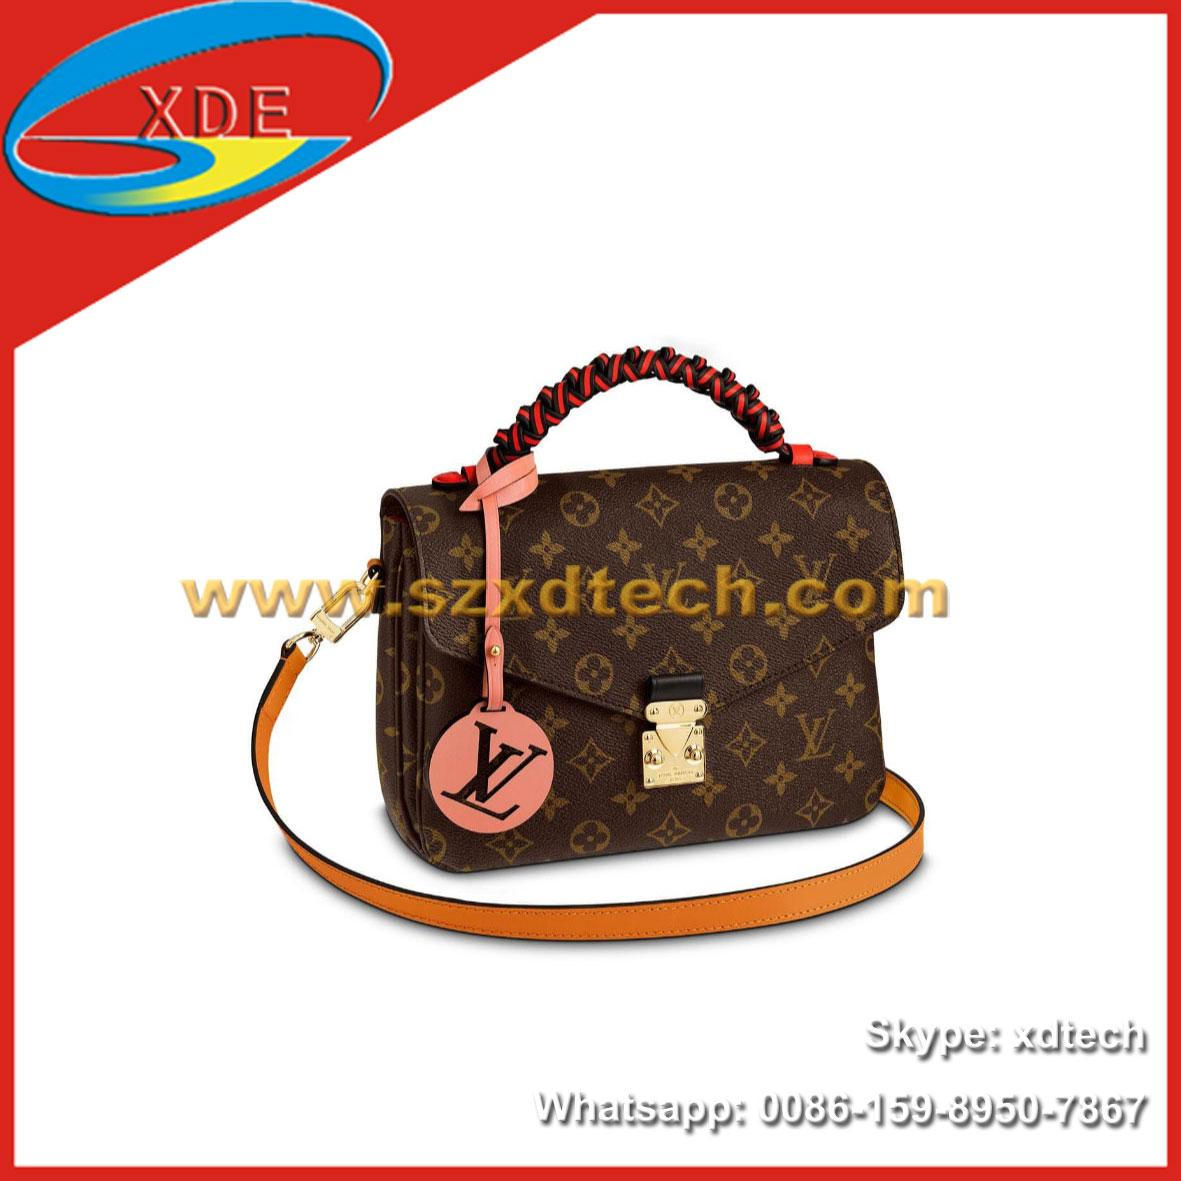 Replica Louis Vuitton POCHETTE METIS M43984 Monogram Bags